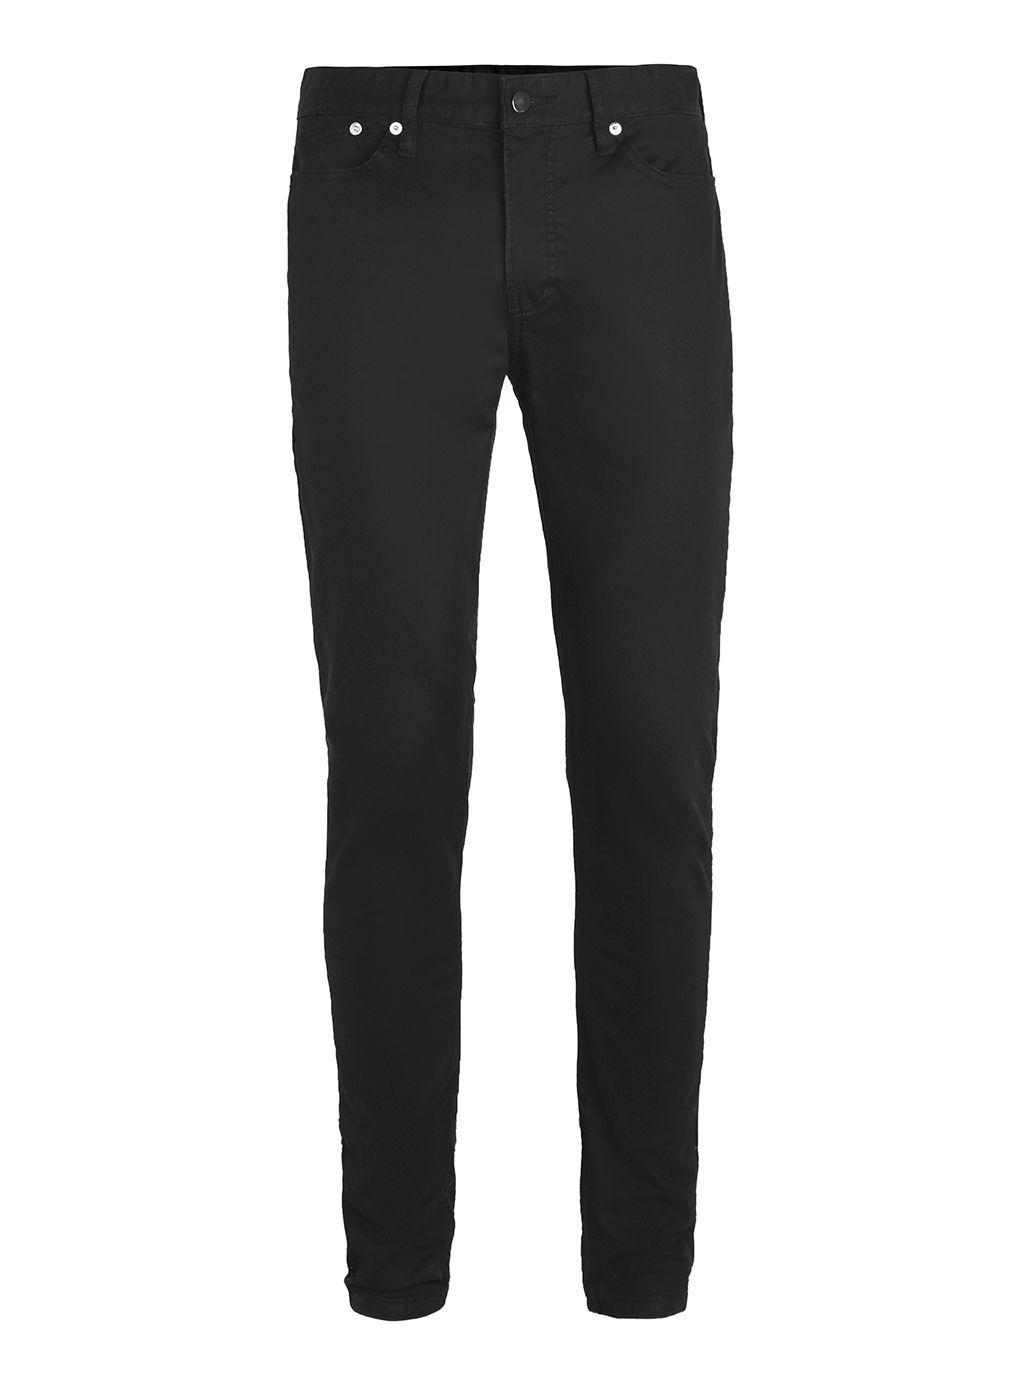 Black Skinny Jeans Topman 37